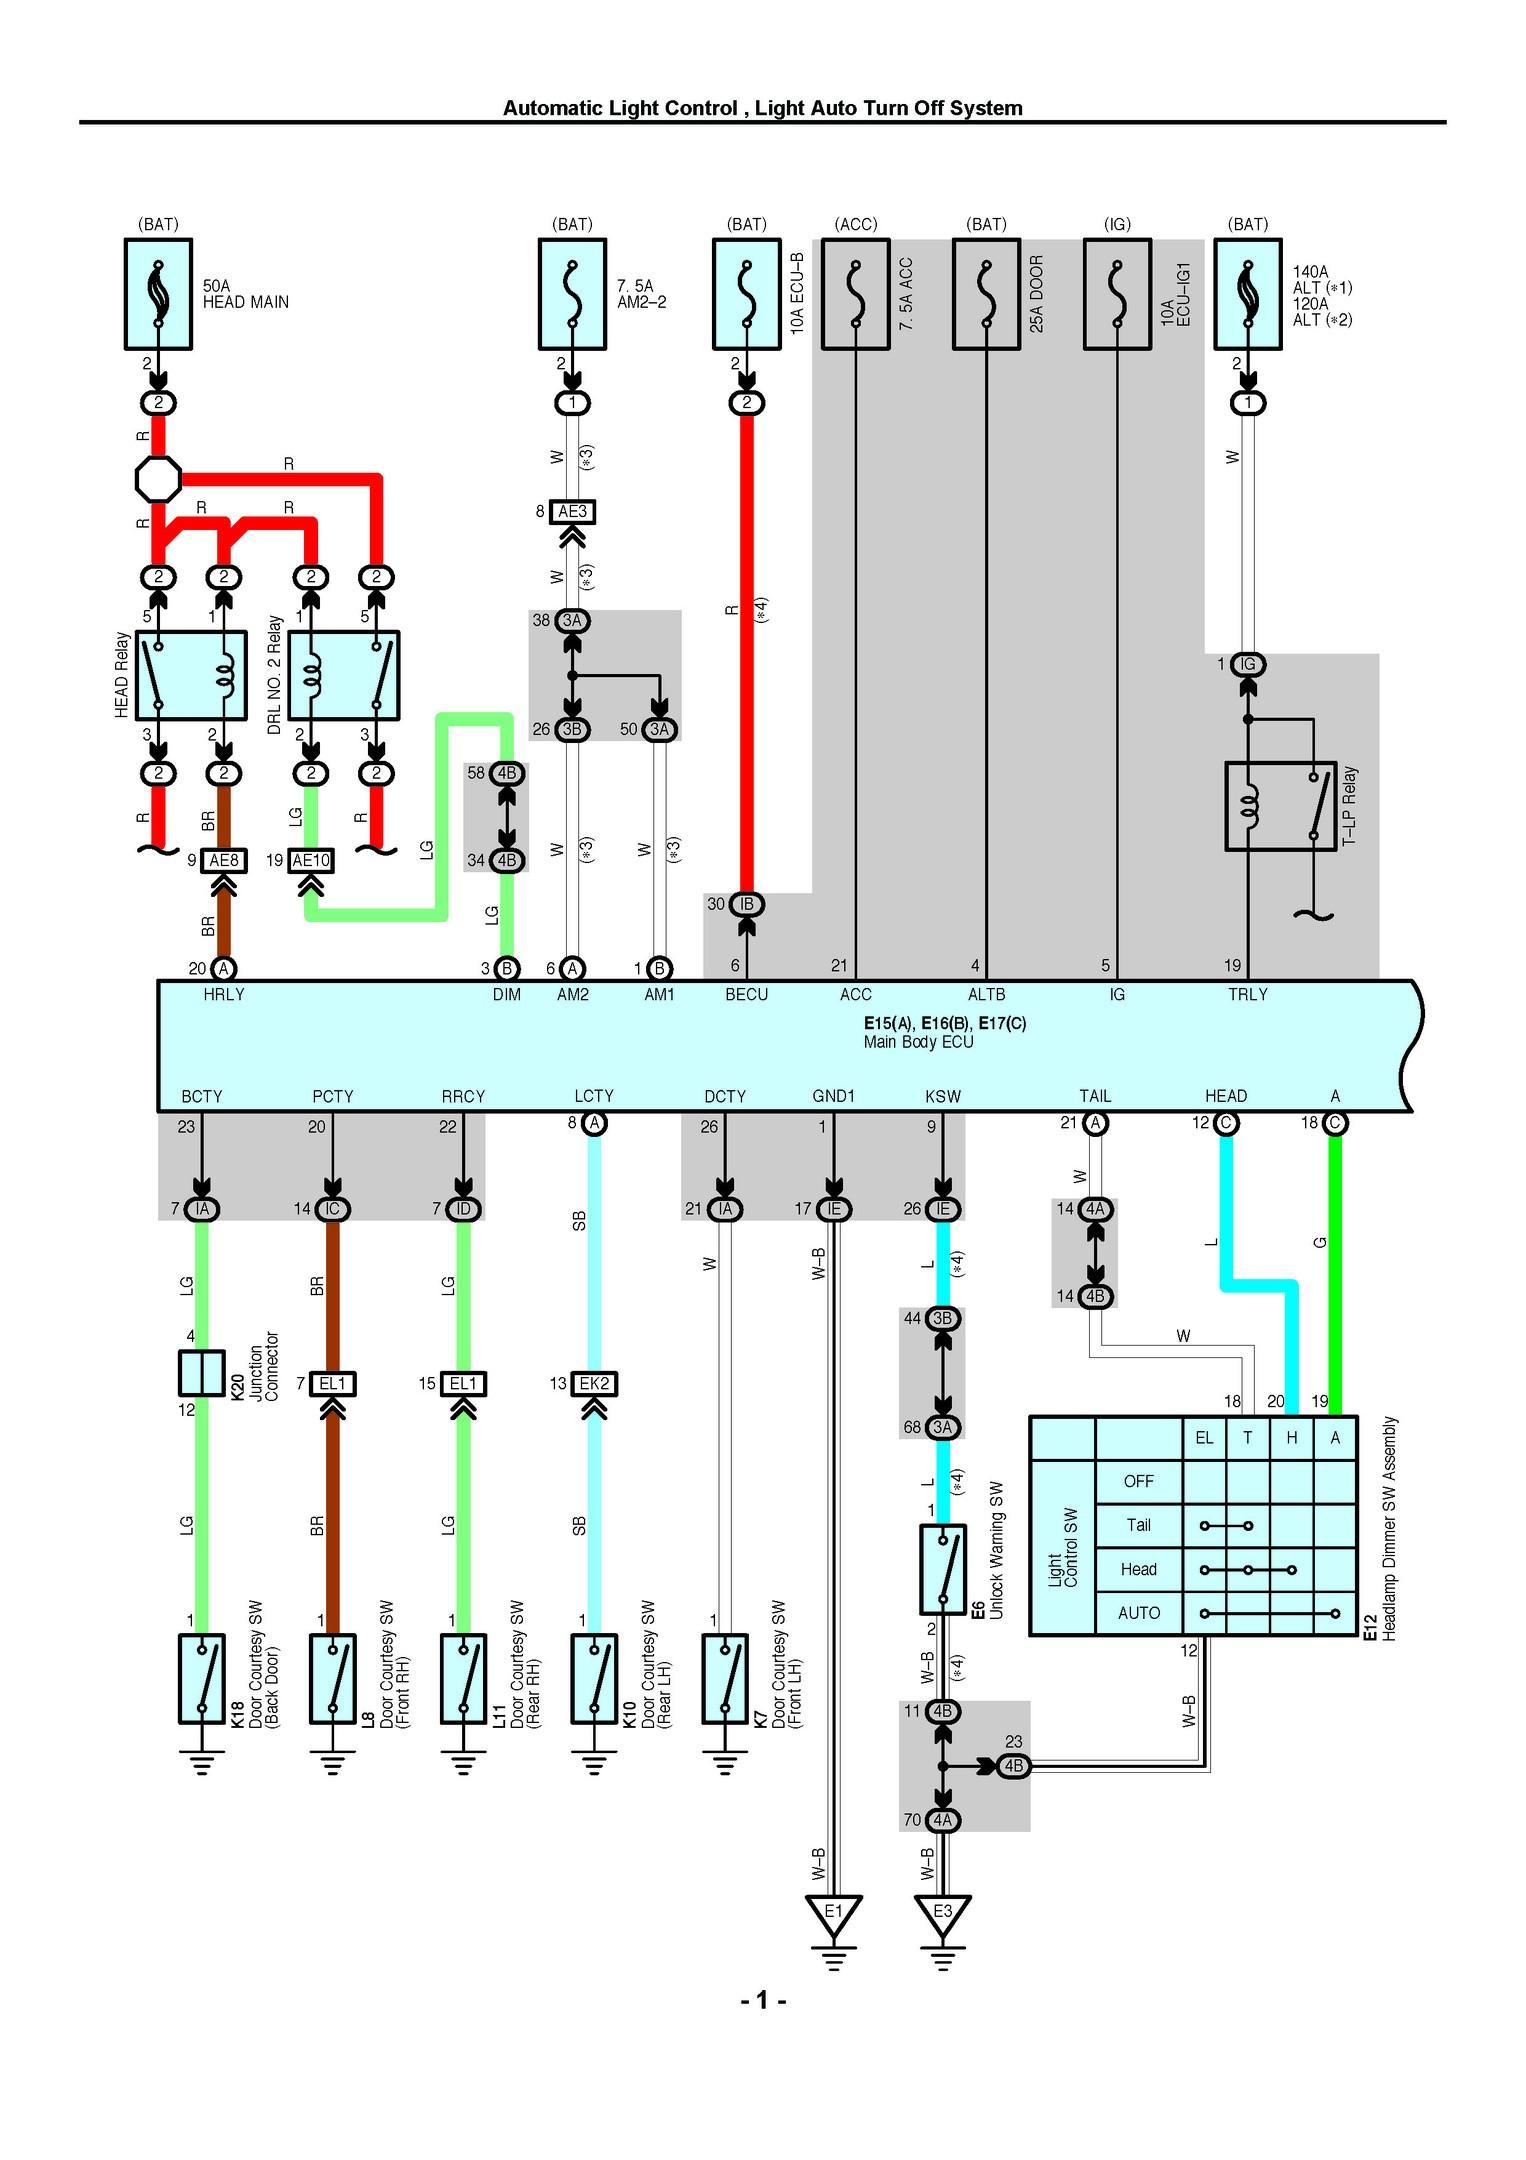 toyota rav4 wiring wiring diagram centre toyota rav4 electrical wiring diagram free 2011 2012 toyota rav4